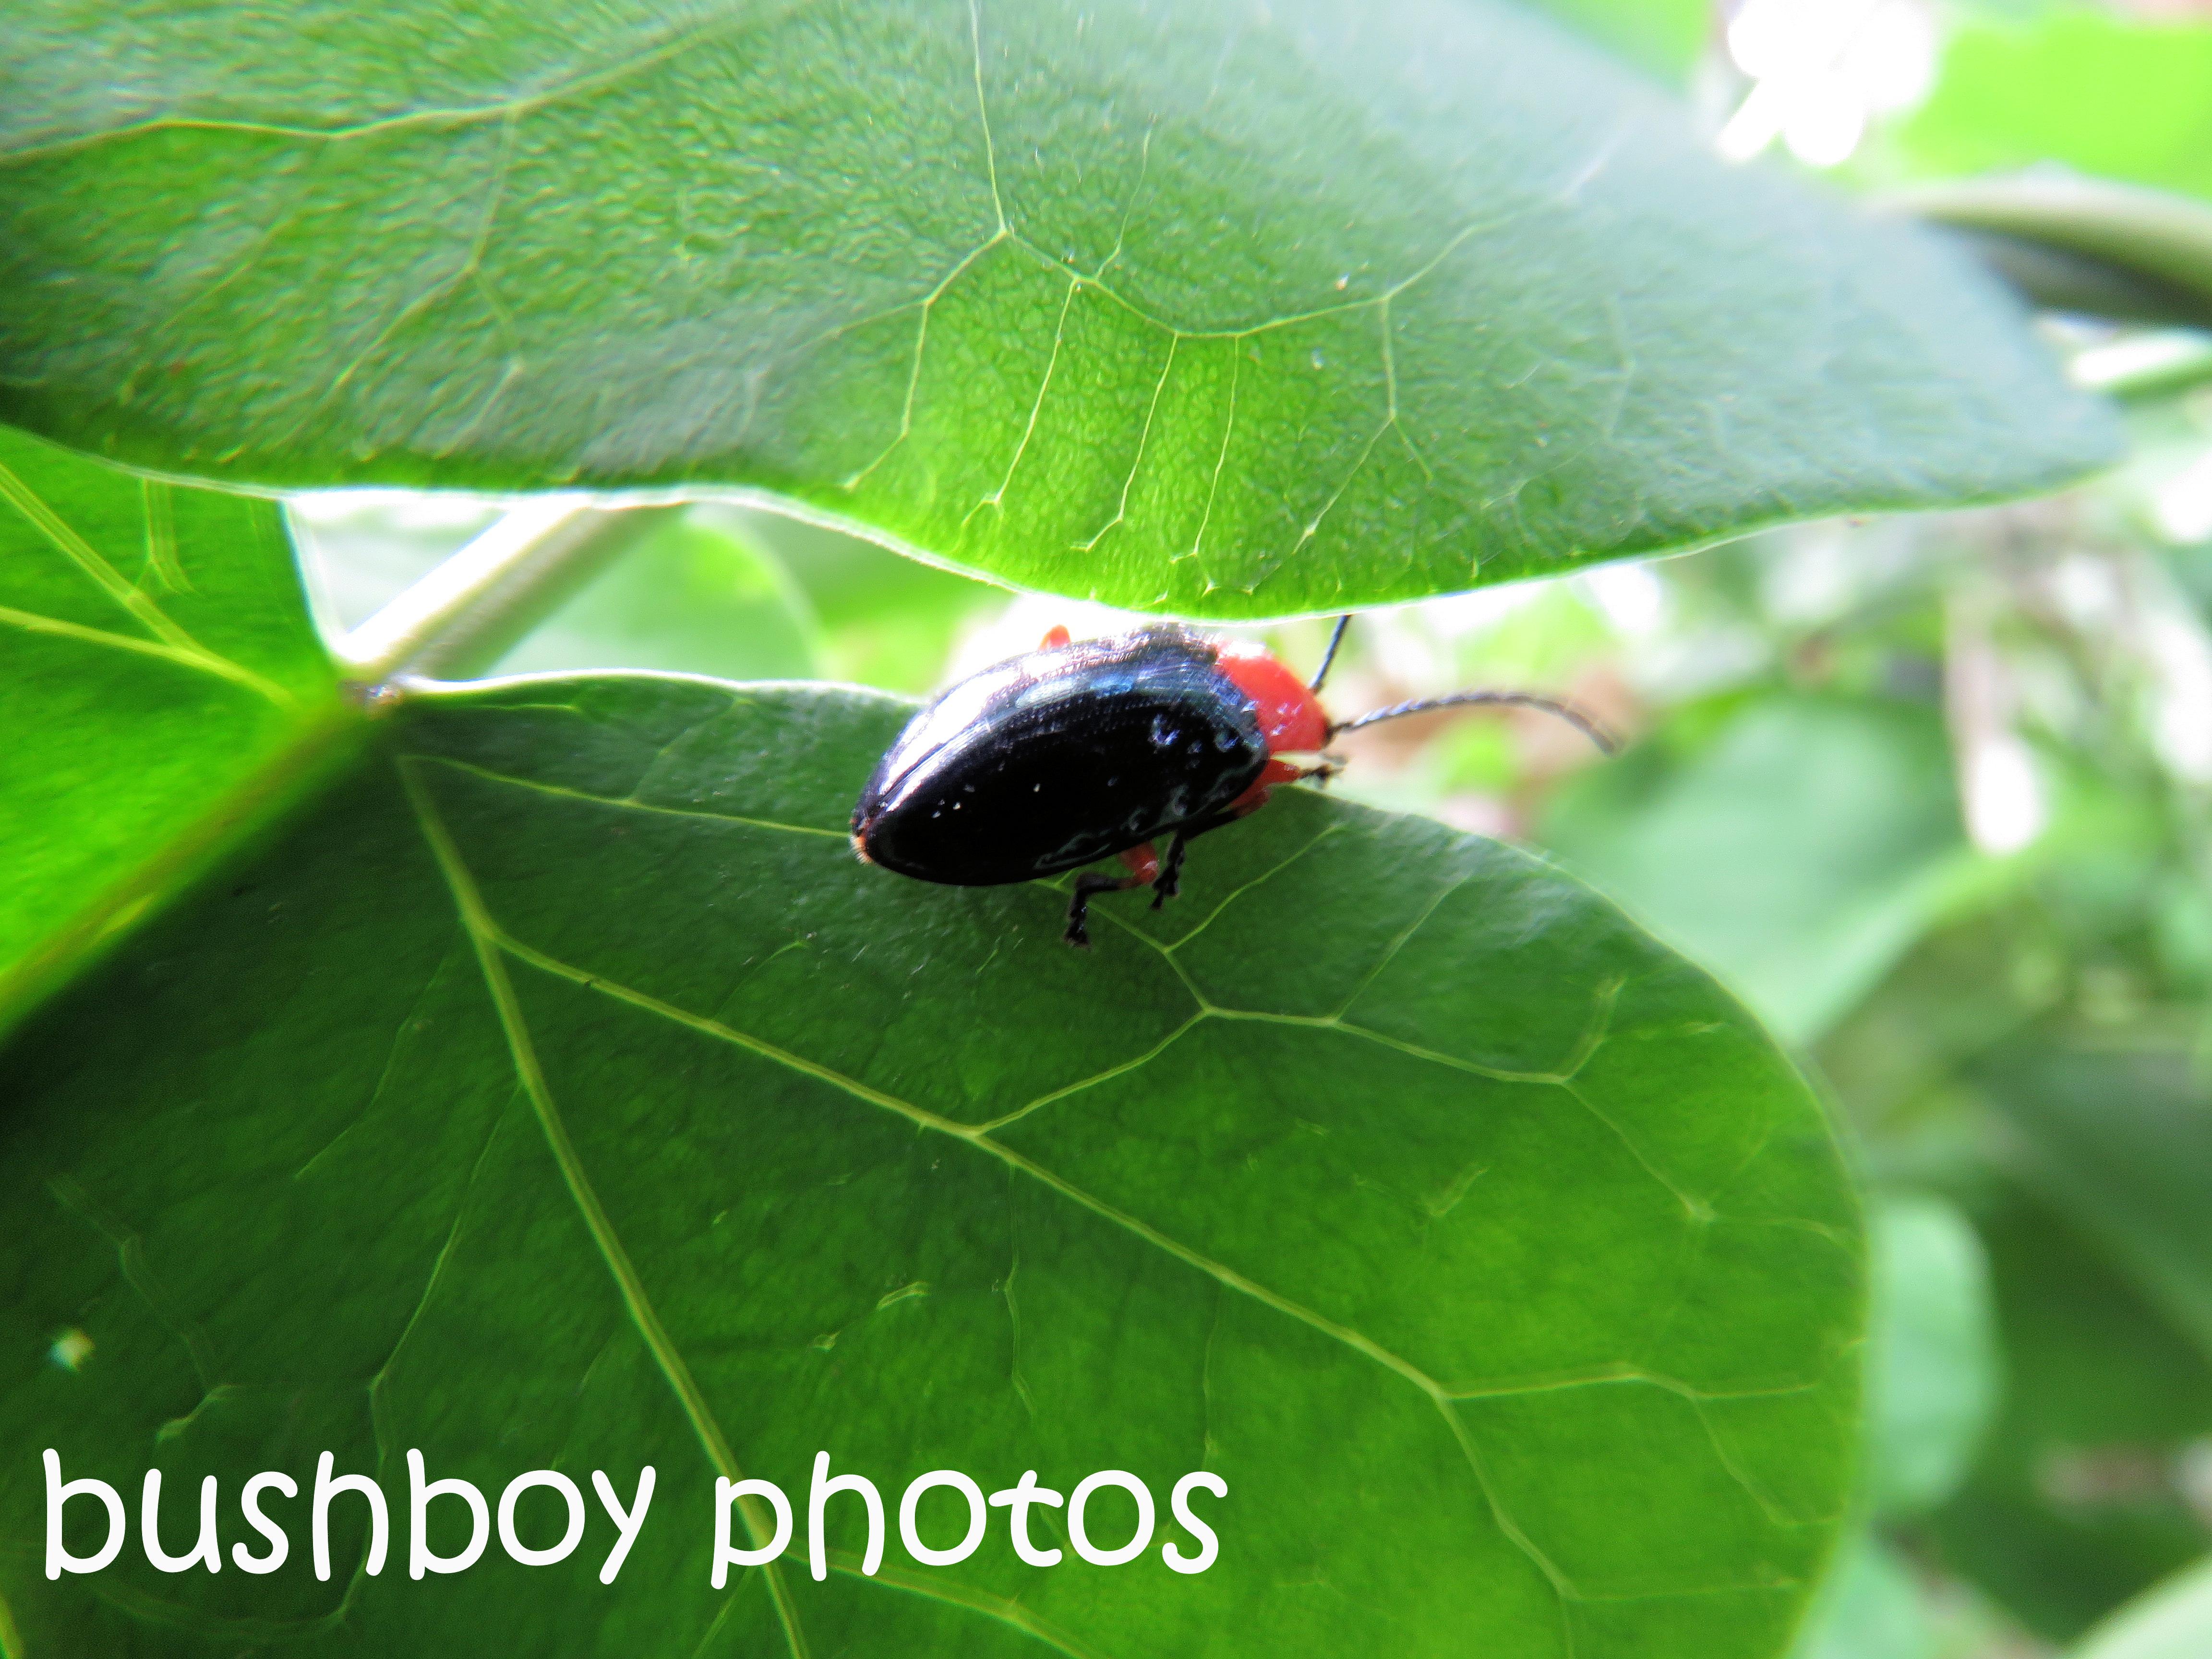 insect_named_binna-burra_oct-2016